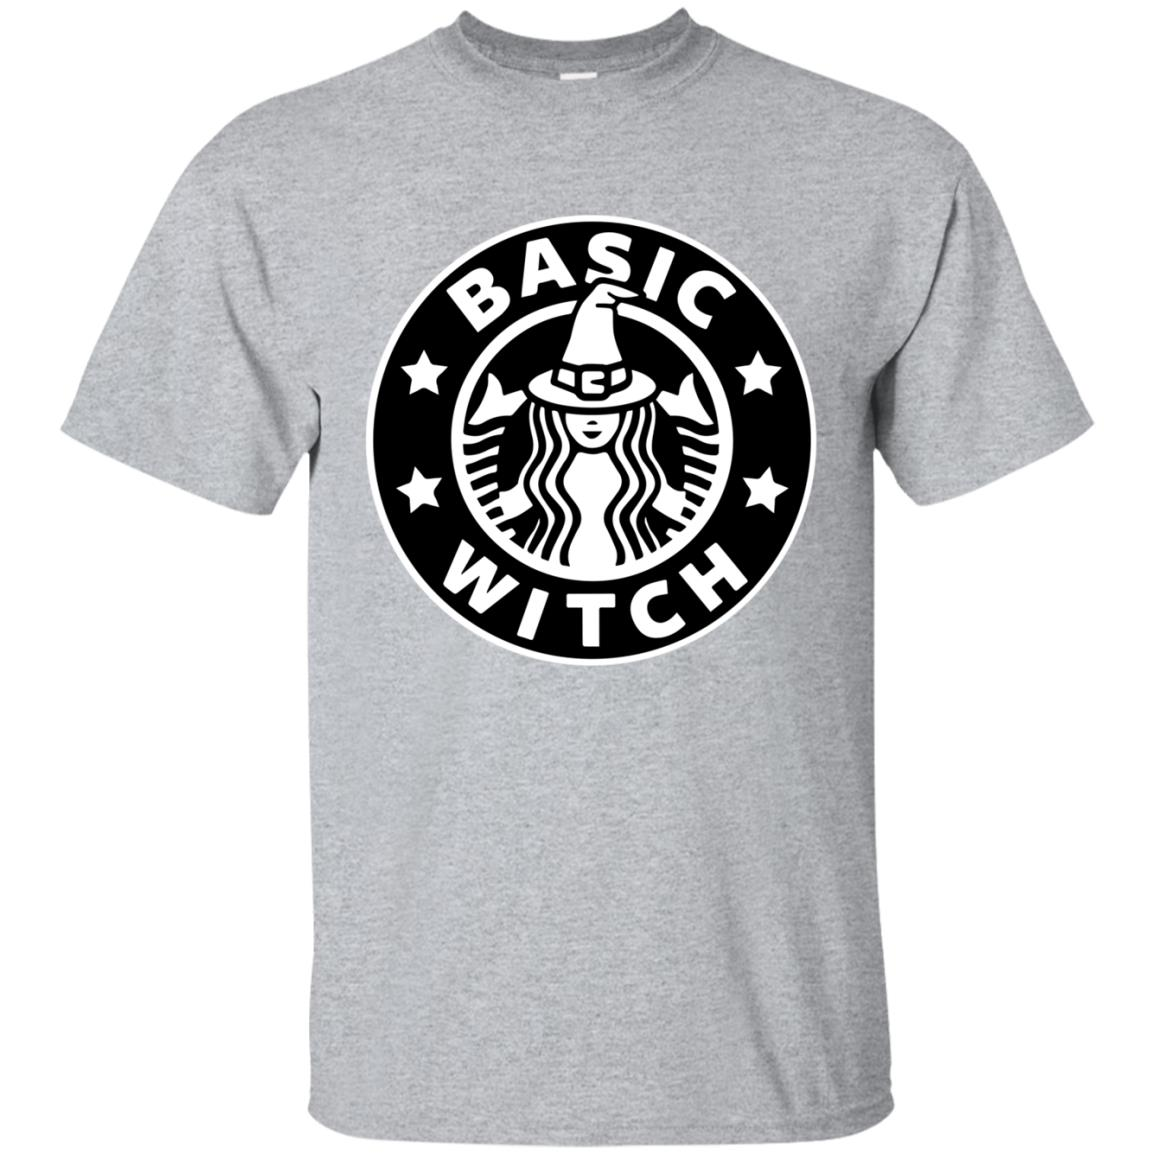 image 1013 - Basic Witch Shirt, Halloween Starbuck parody